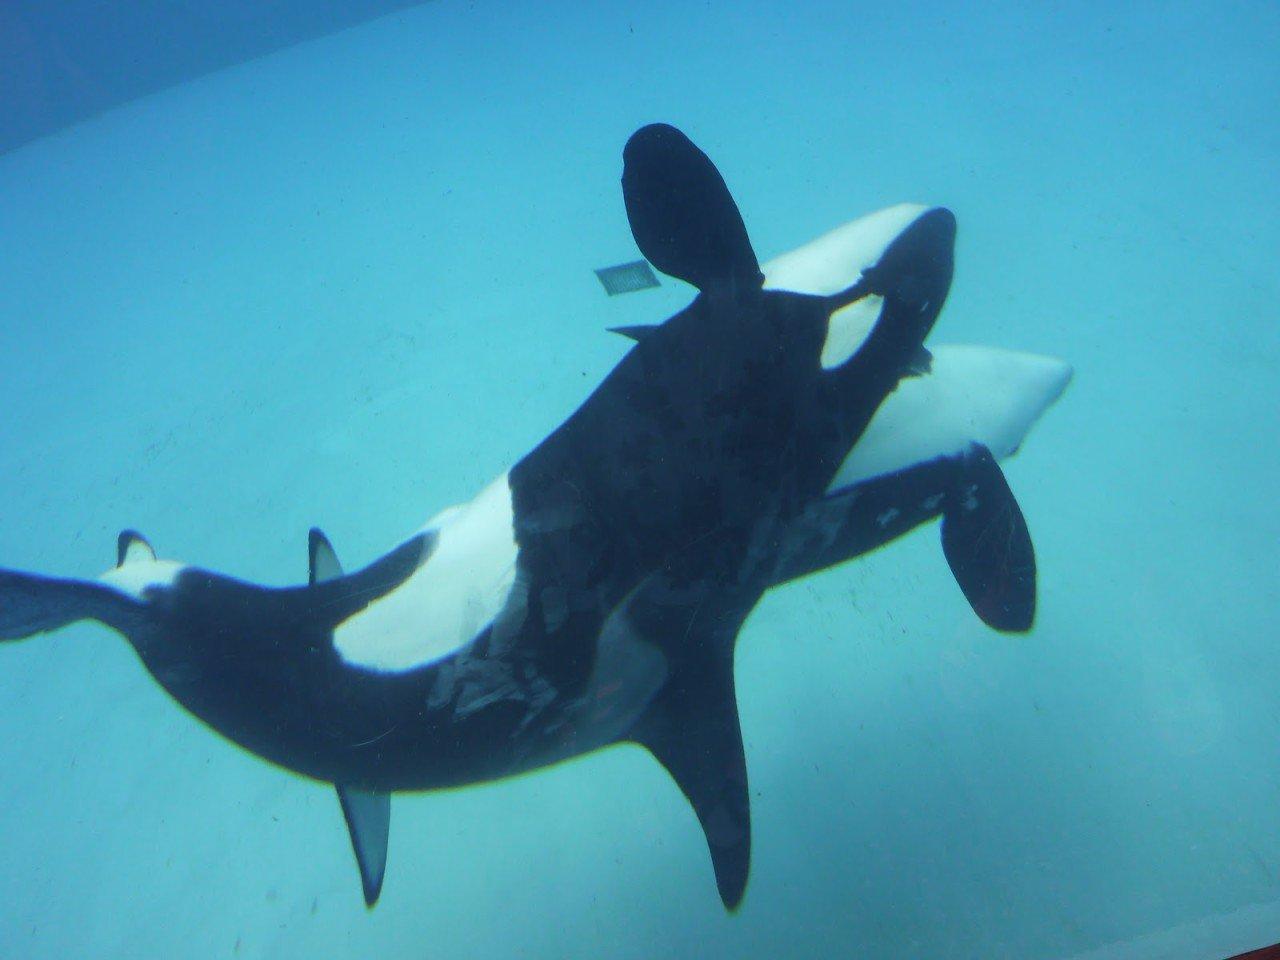 P1060100.jpg 고래 성기의 위엄